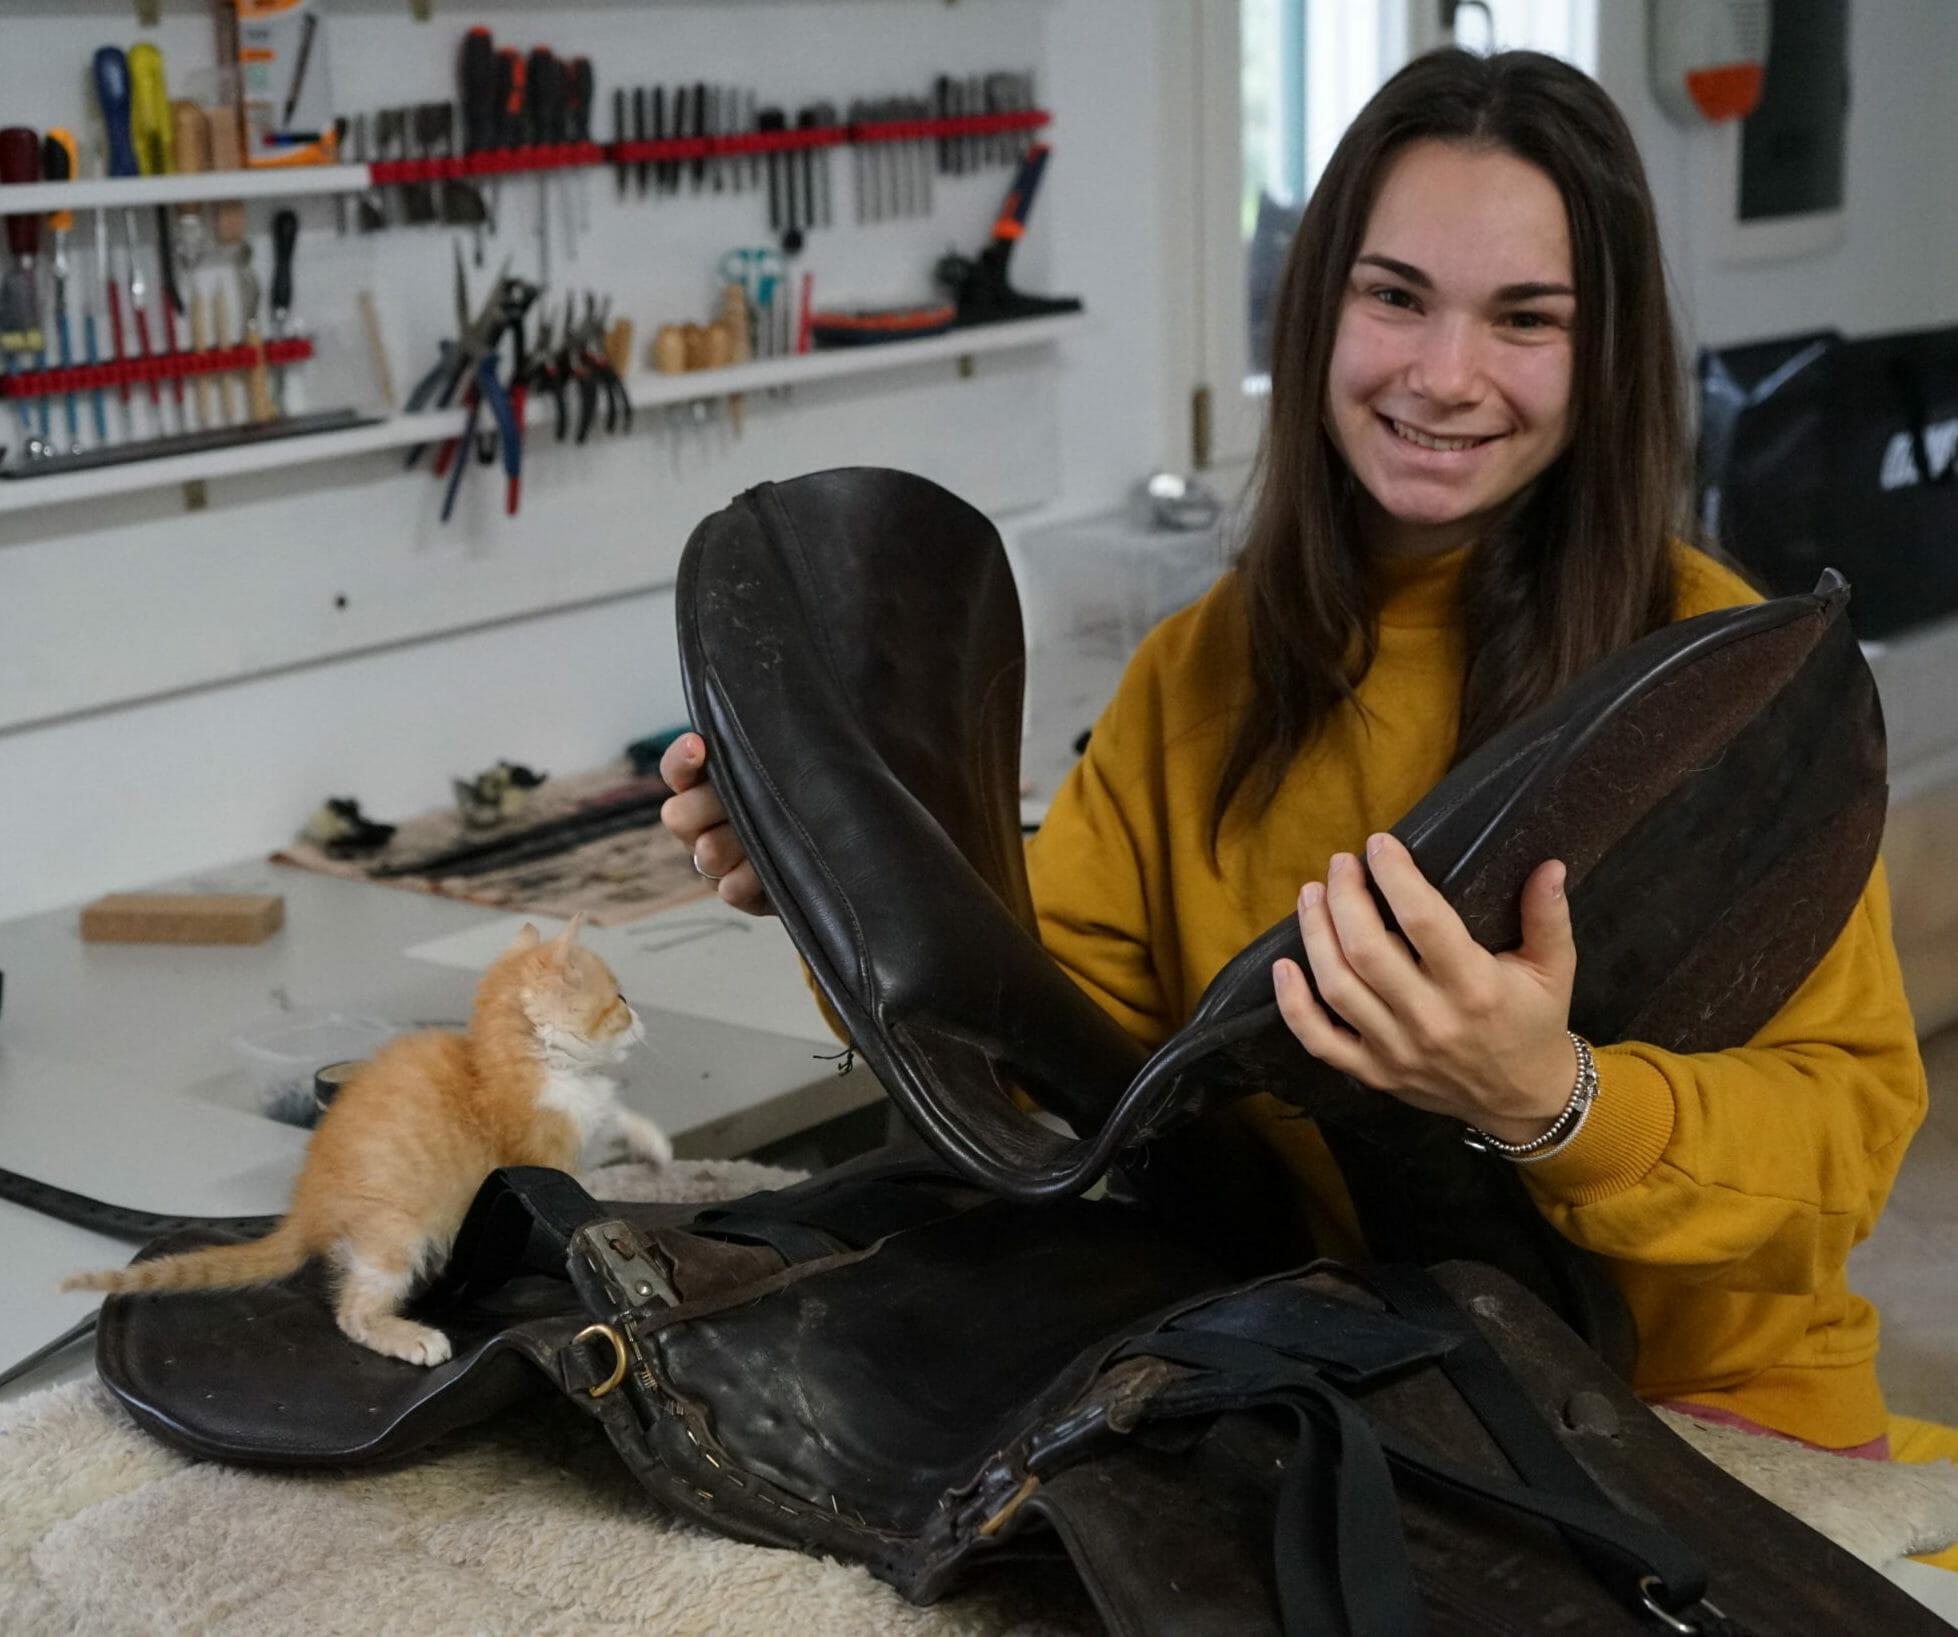 Ilaria saddle service - about ilaria